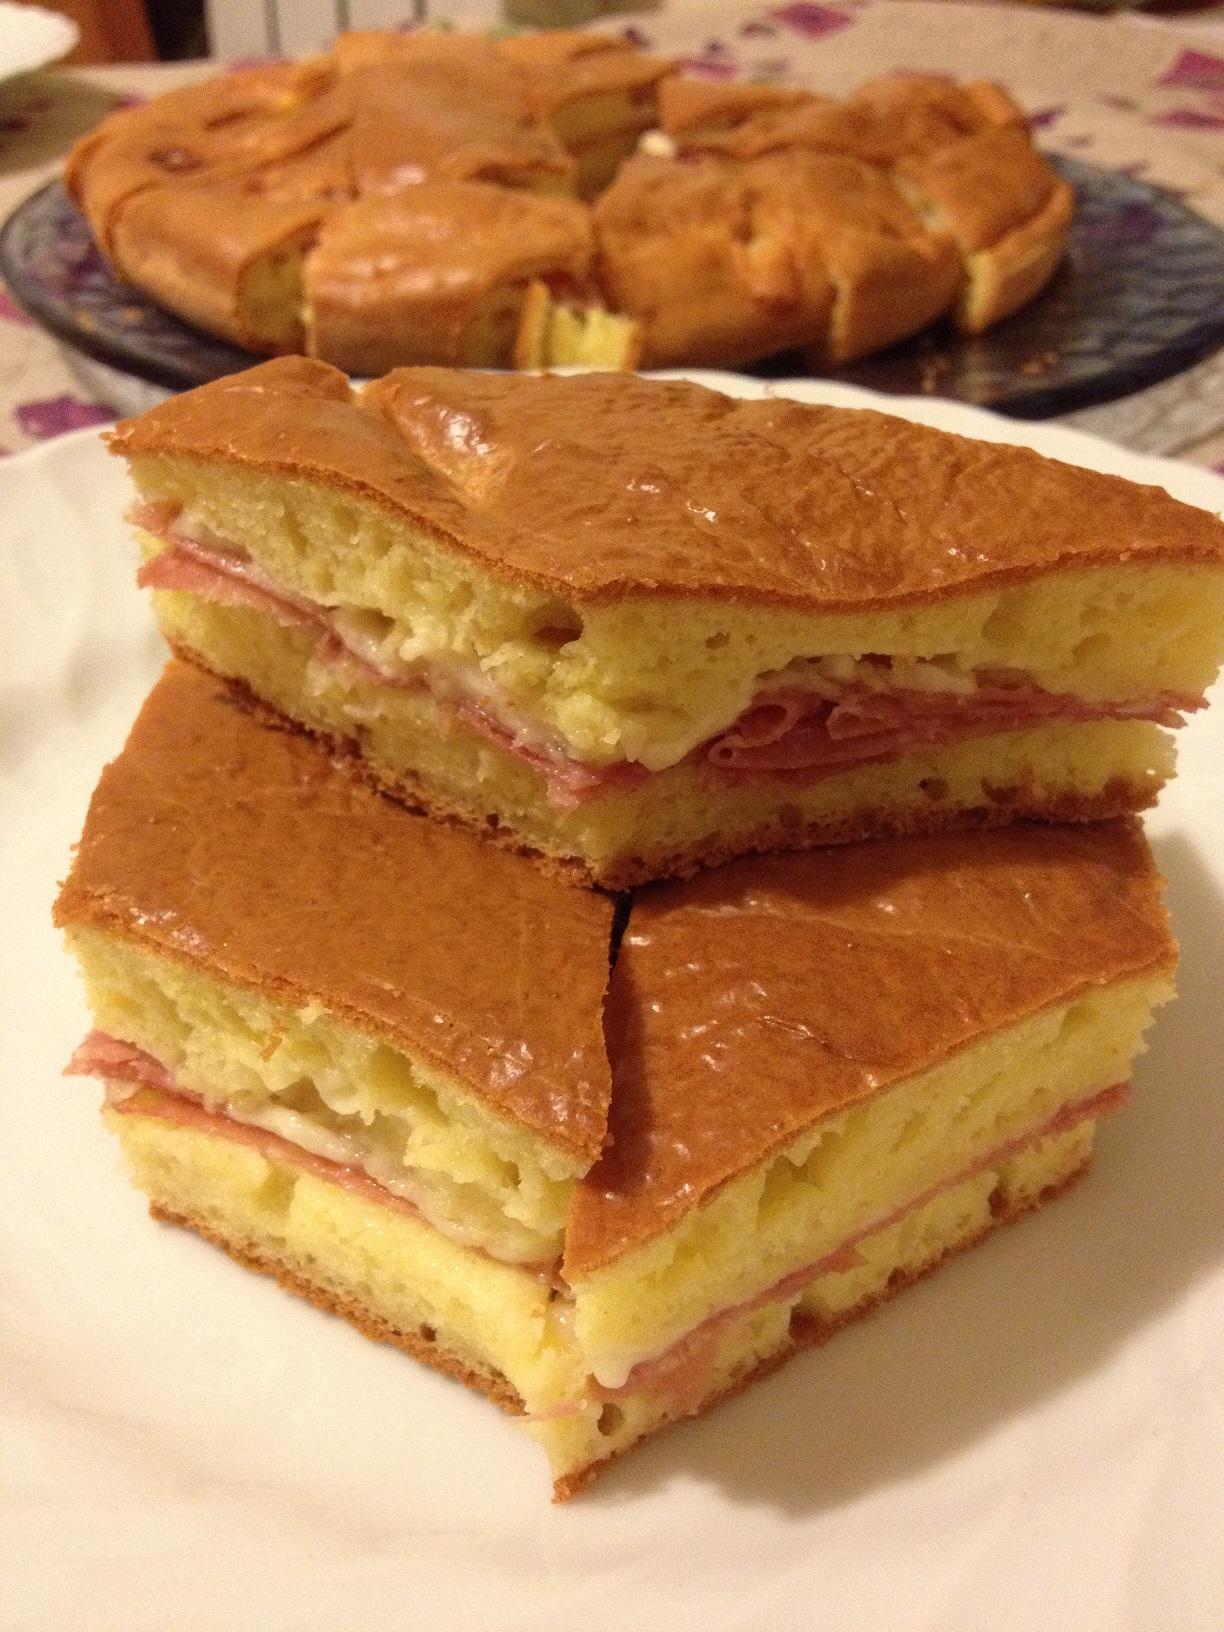 Fabuleux Bocconcini salati al salame e formaggio | Paola e le torte OP36